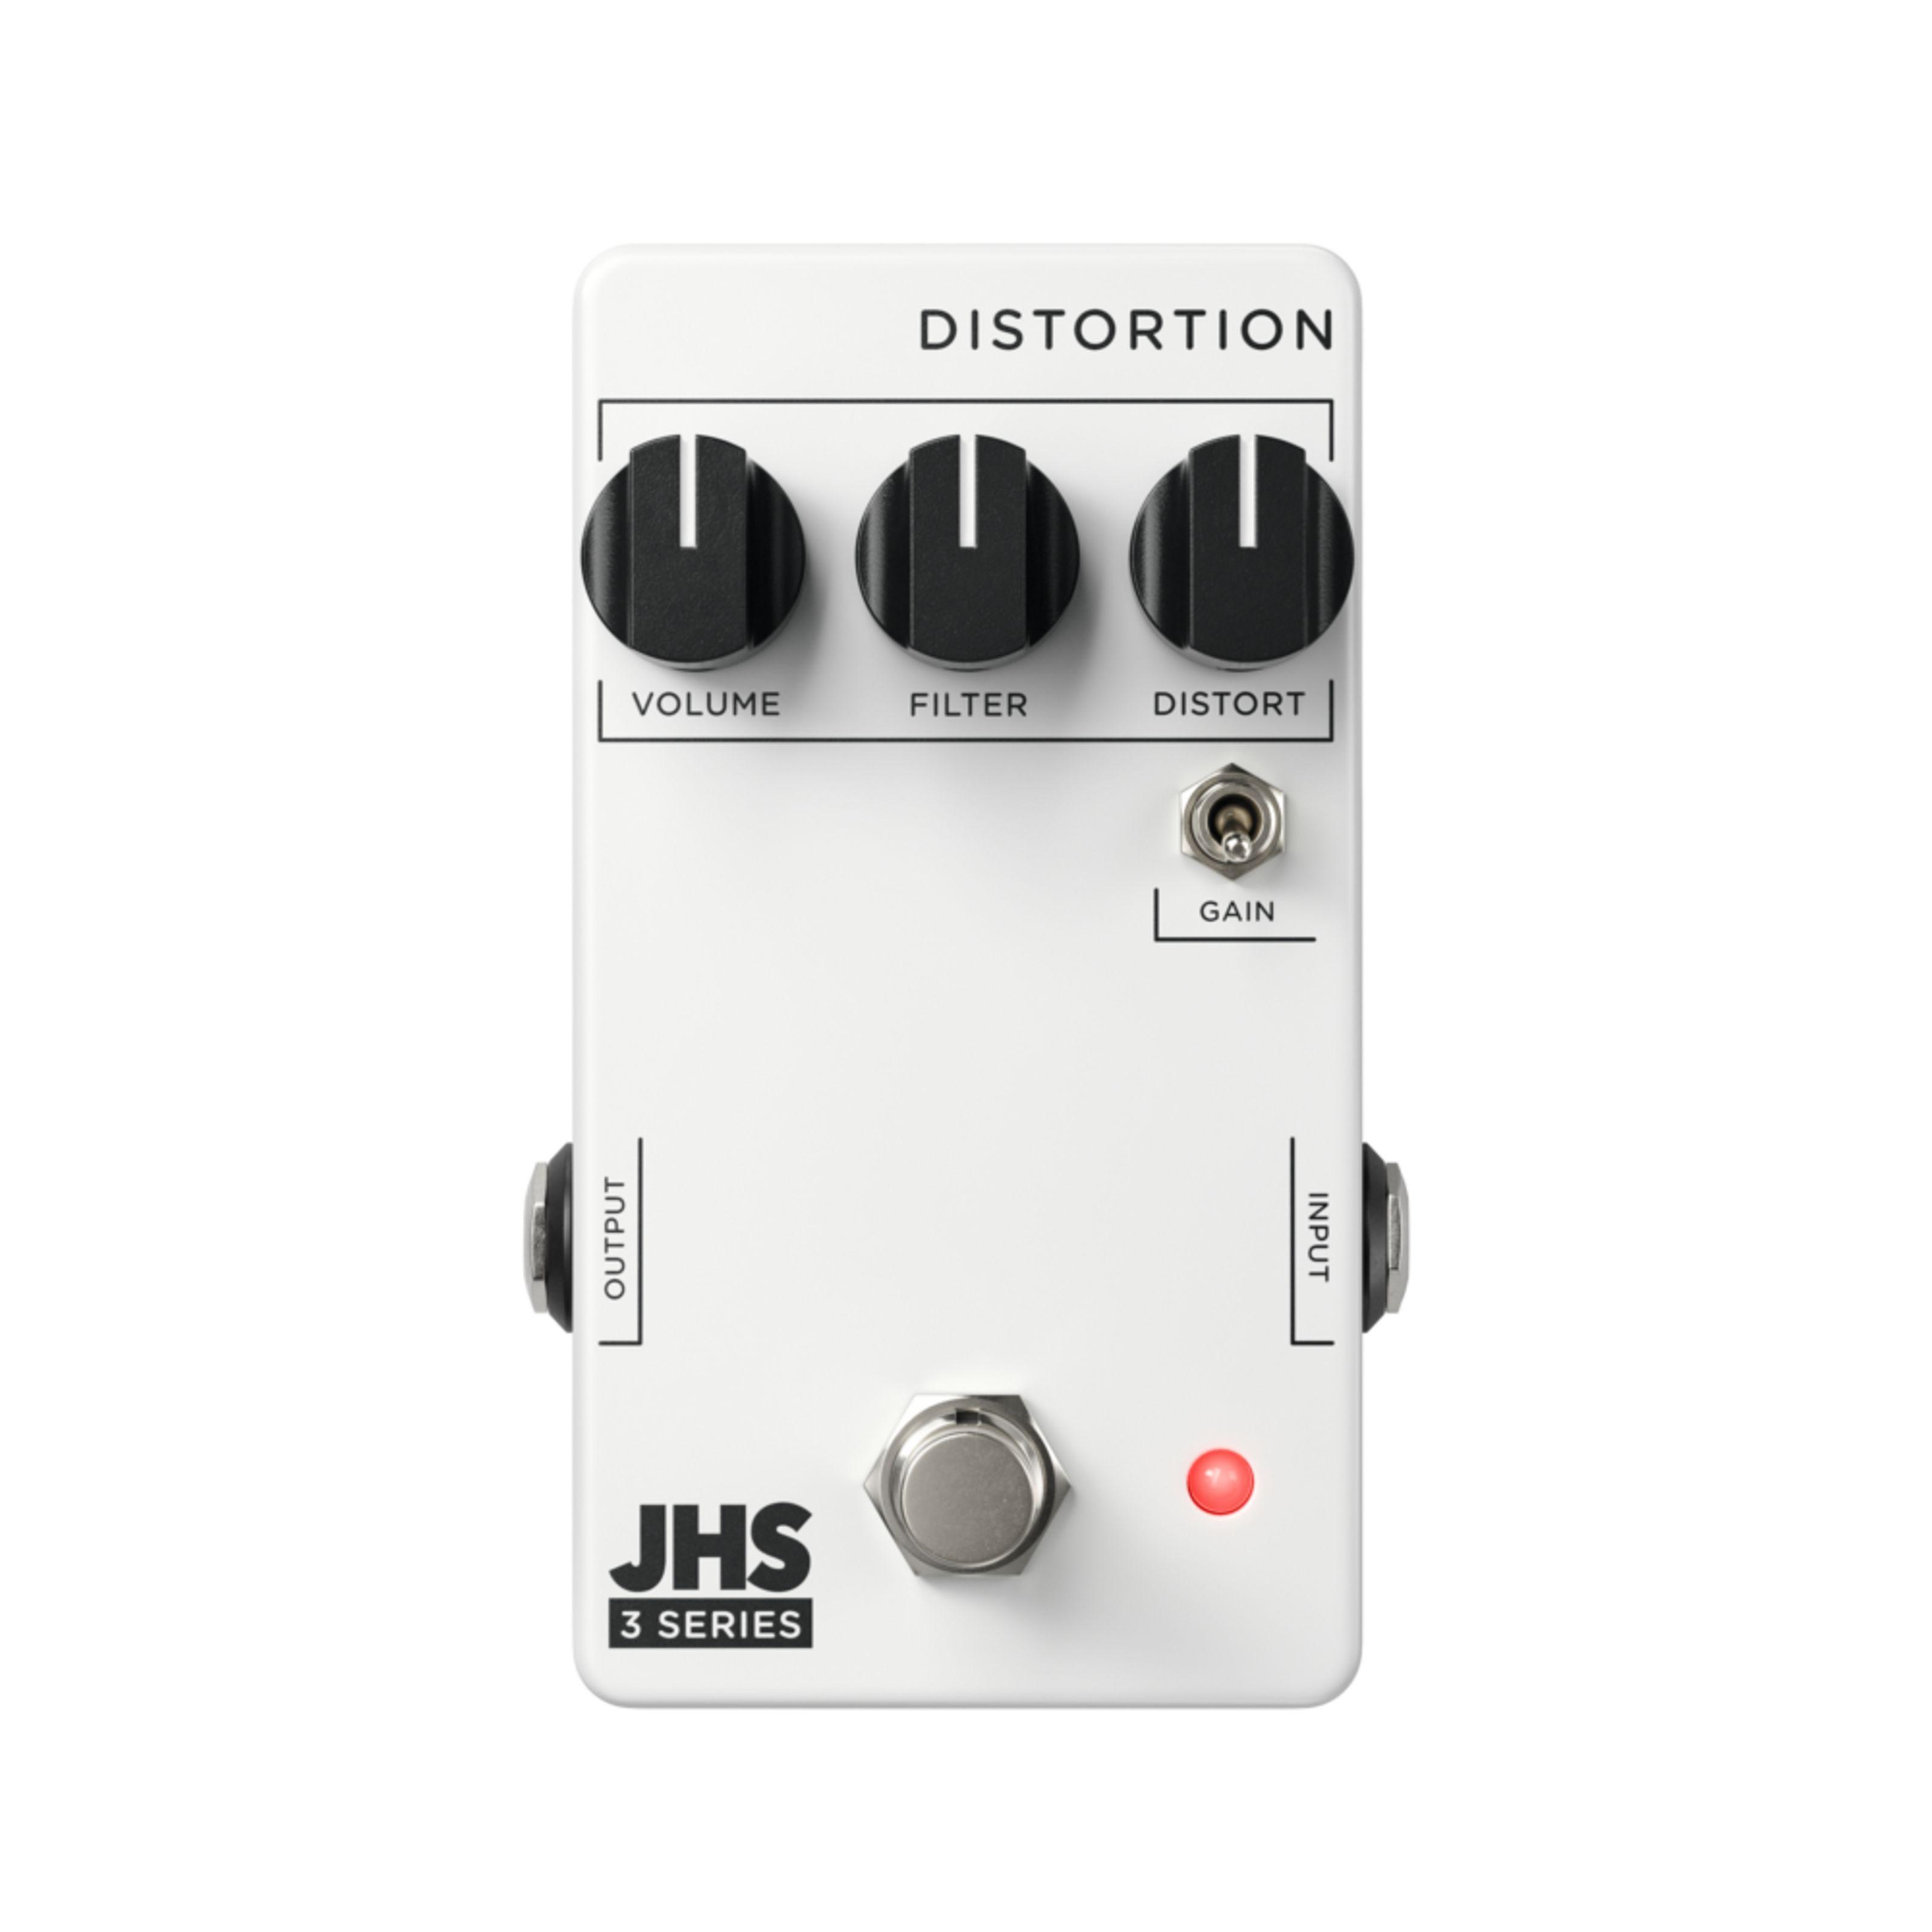 JHS Pedals - 3 Series Distortion JHS 3S DISTORTION